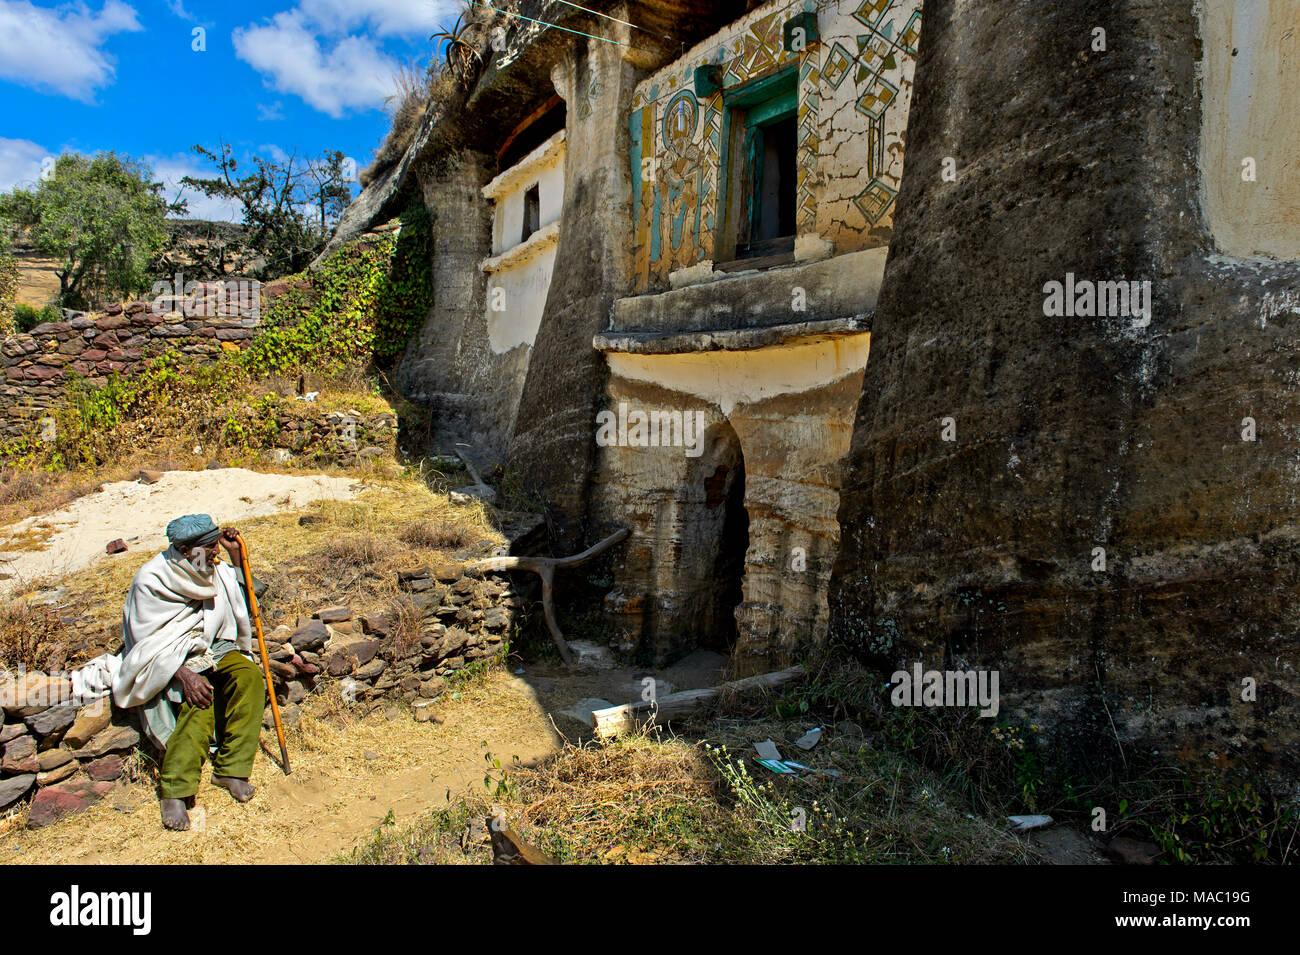 Pilgrim at the entrance  to the orthodox rock-hewn church Medhane Alem Kesho, Tigray region, Ethiopia - Stock Image